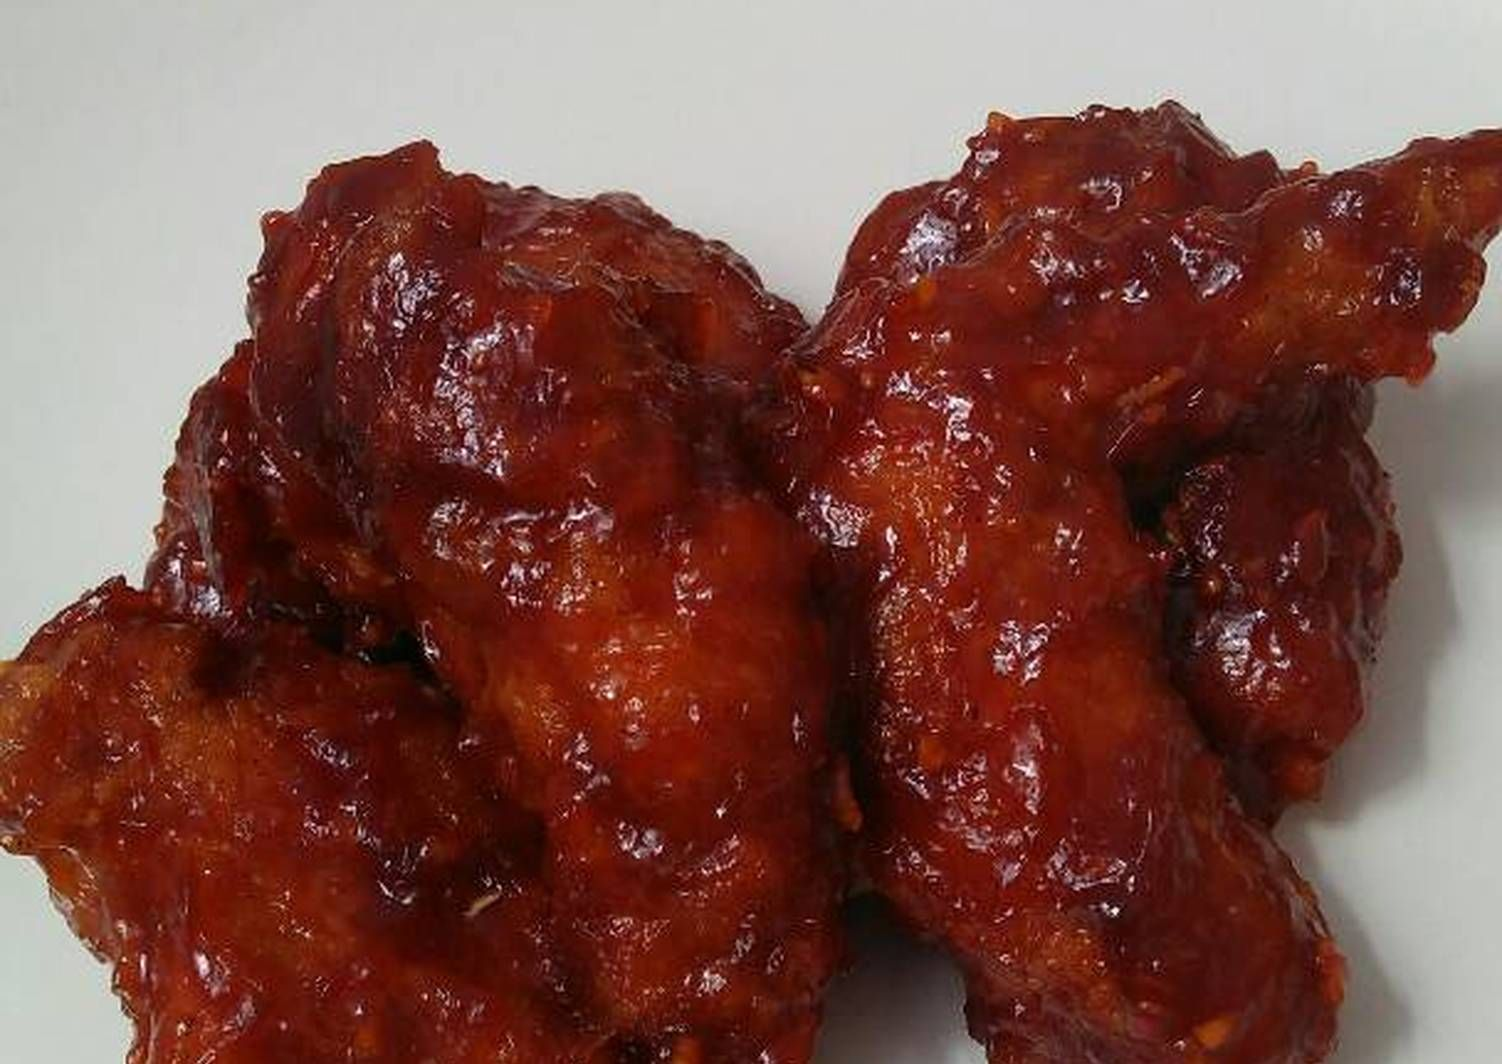 Resep Ayam Pedas Fire Wings Ala Richeese Oleh Ridha Firmansyah Resep Di 2020 Resep Ayam Sayap Ayam Resep